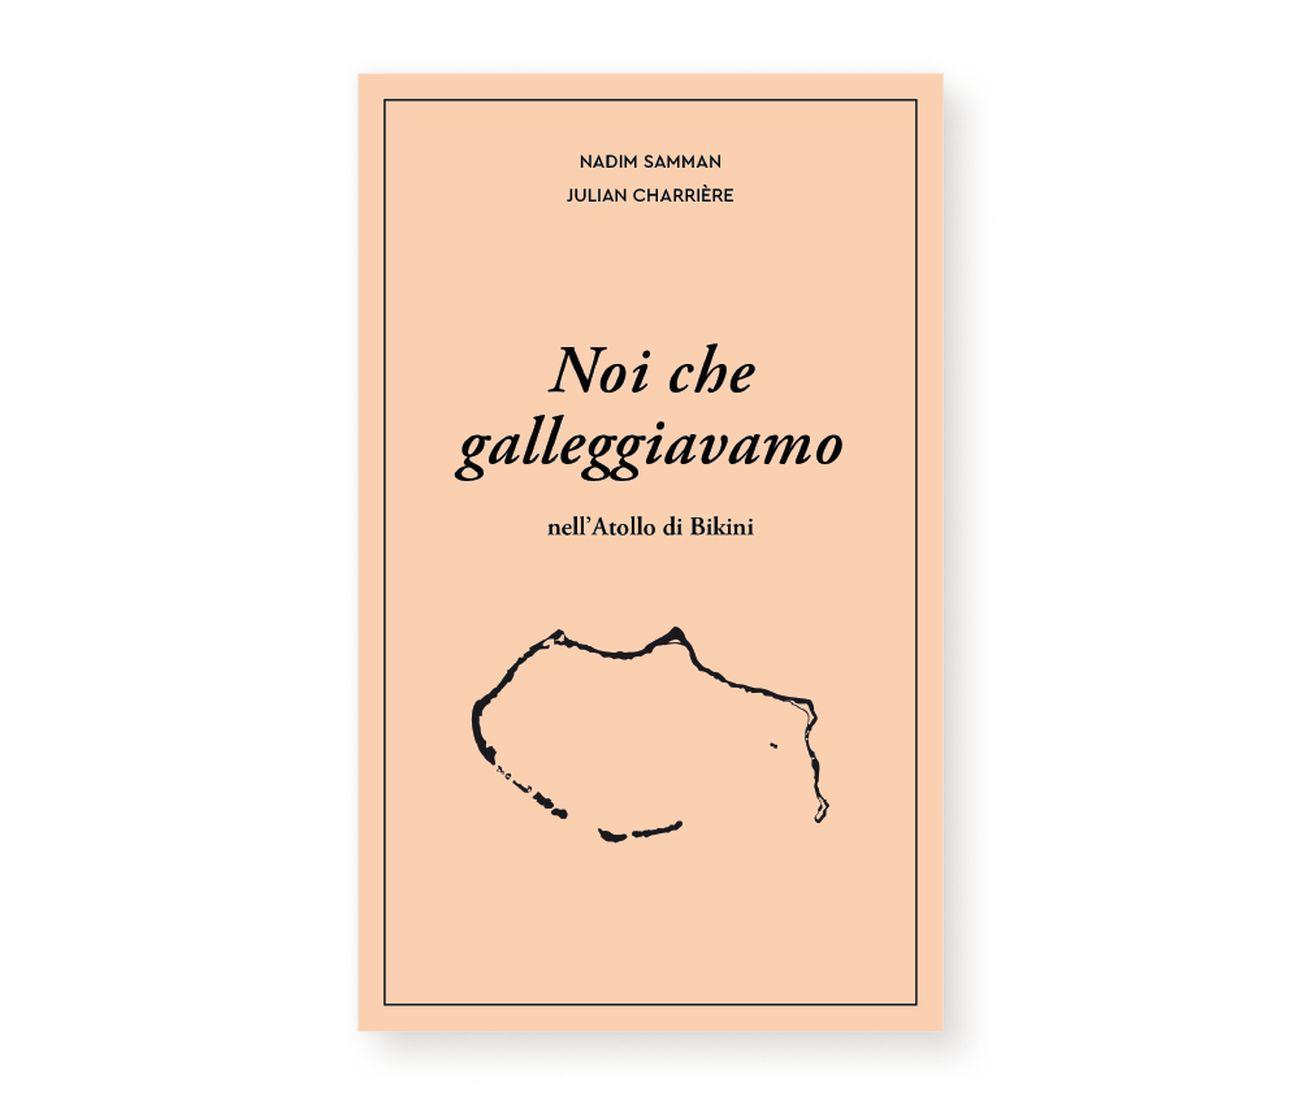 Julian Charrière & Nadim Samman – Noi che galleggiavamo (Edizioni MAMbo, Bologna 2019)